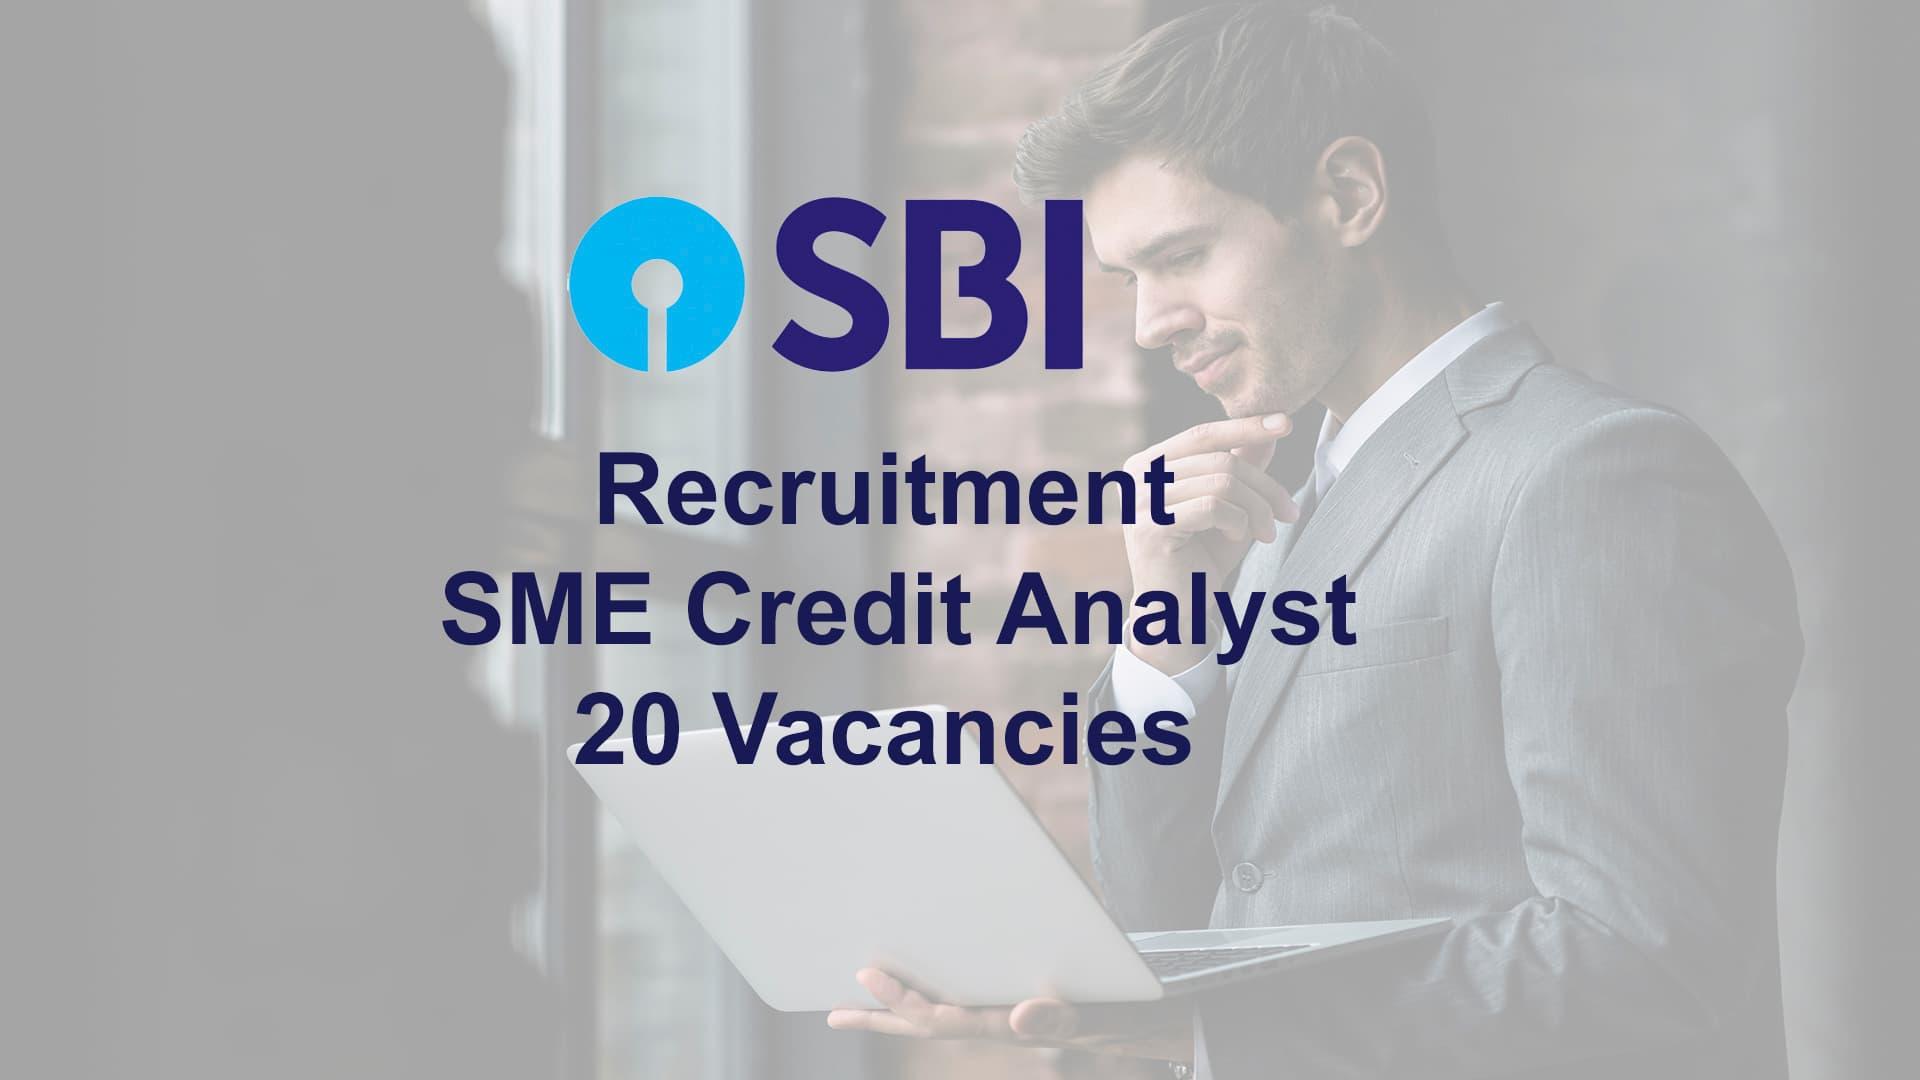 SBI Recruitment of SME Credit Analyst  20 Vacancies